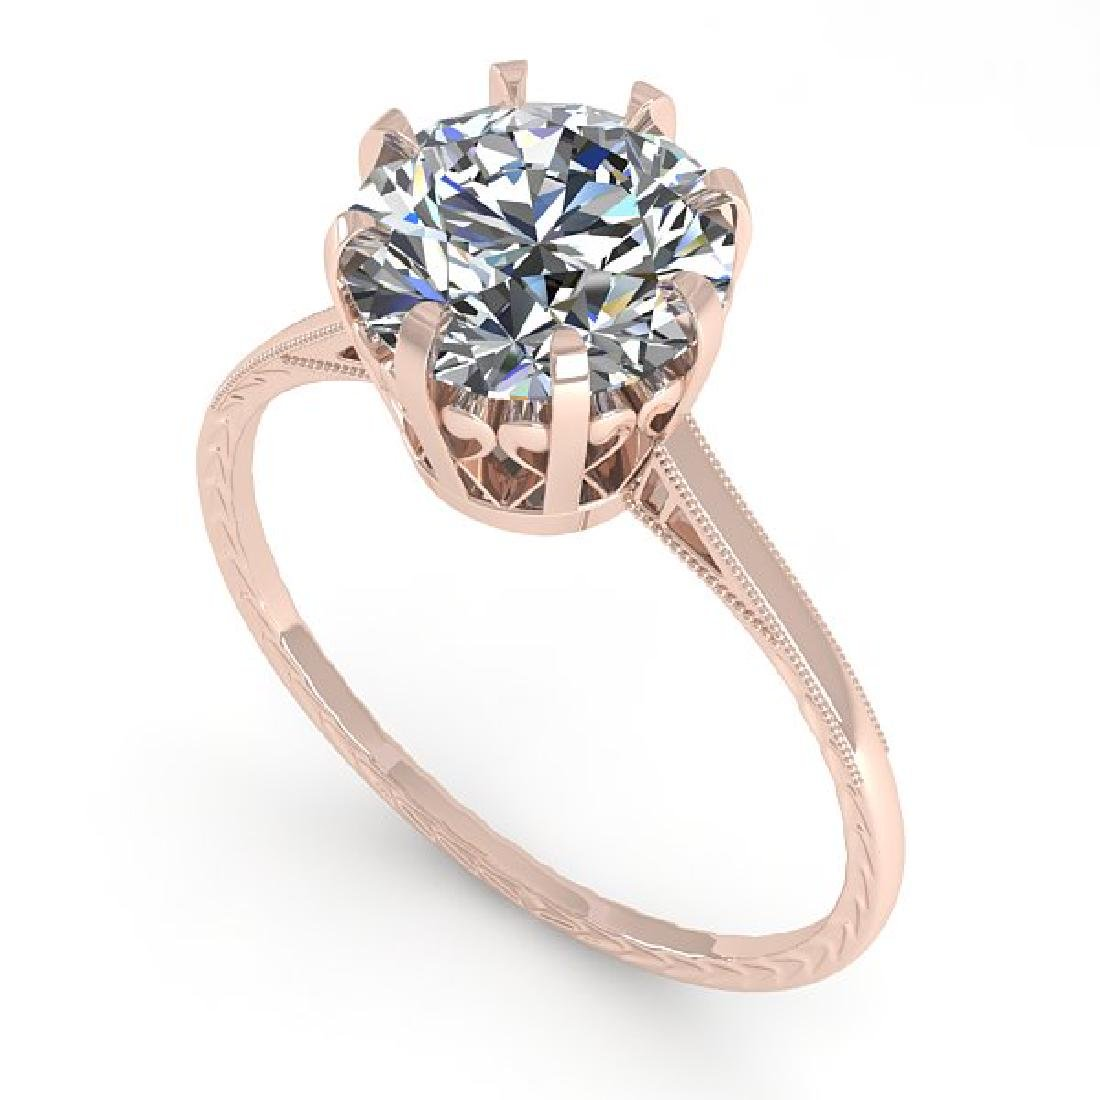 2 CTW VS/SI Diamond Solitaire Engagement Ring 18K Rose - 2